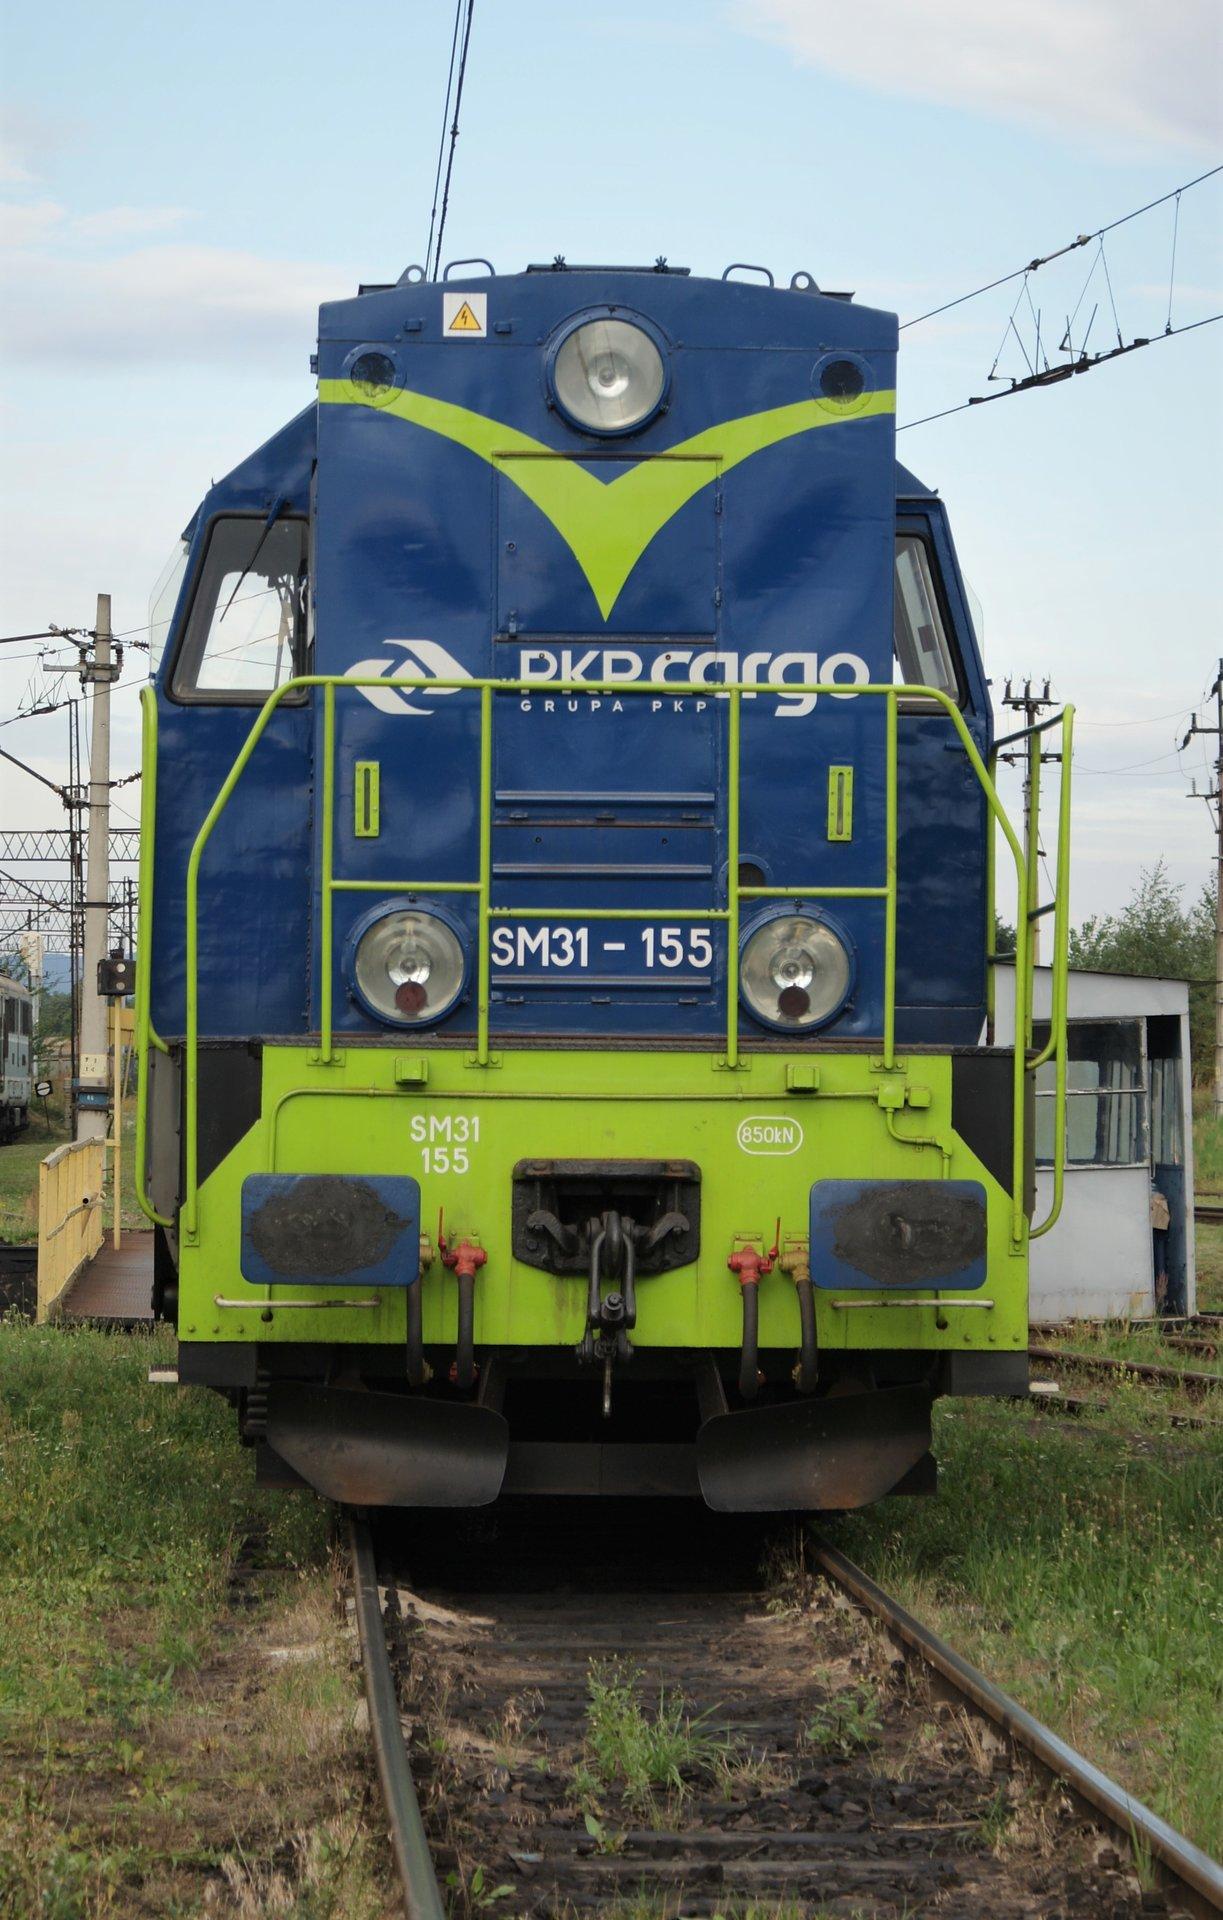 DSC02158 bbbbb.jpg